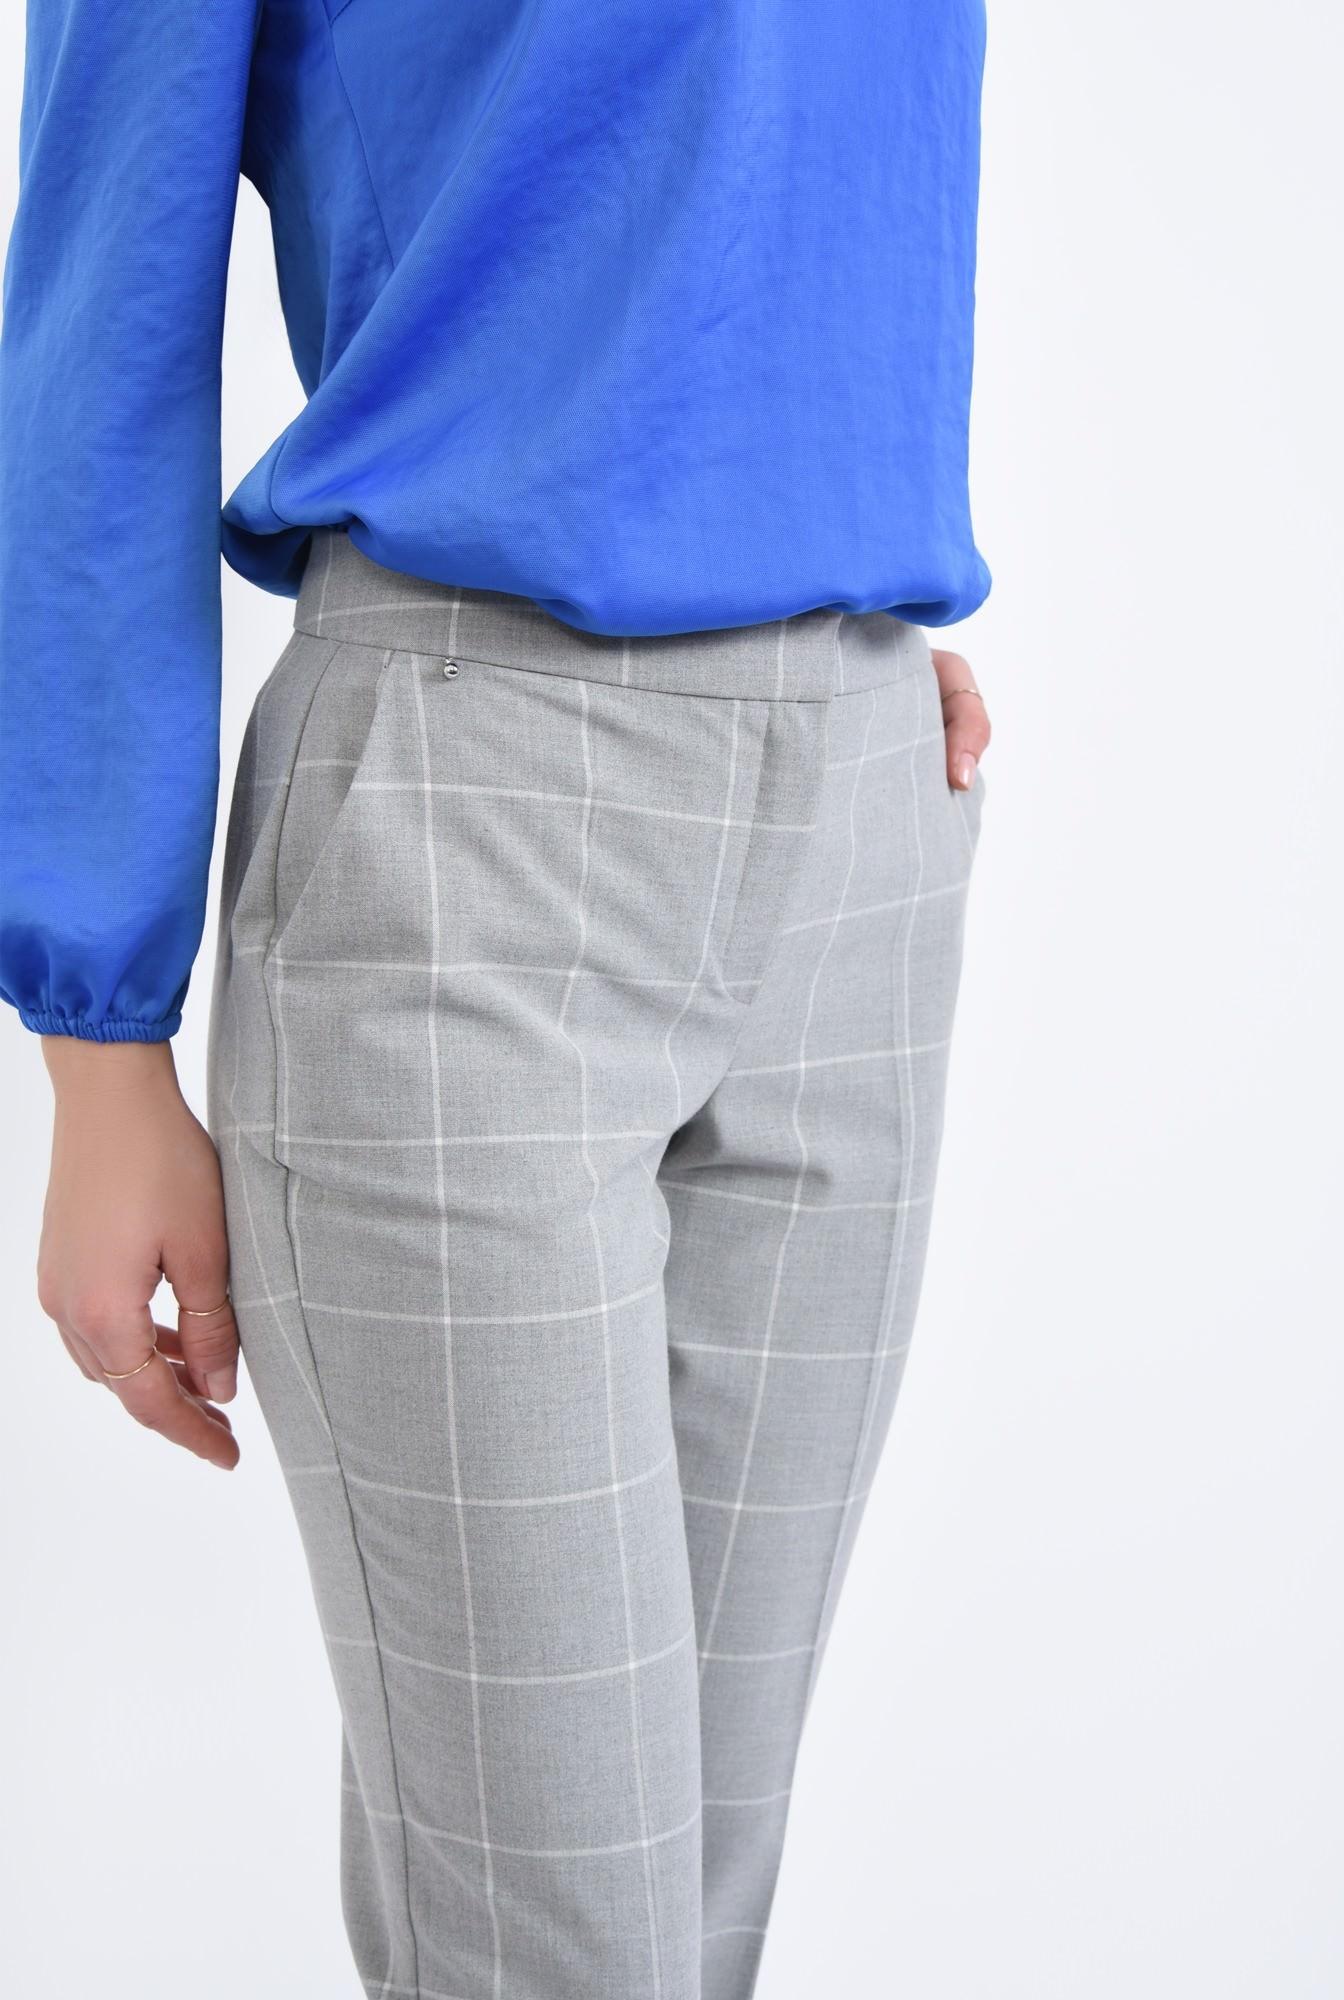 2 - Pantaloni casual, imprimeu